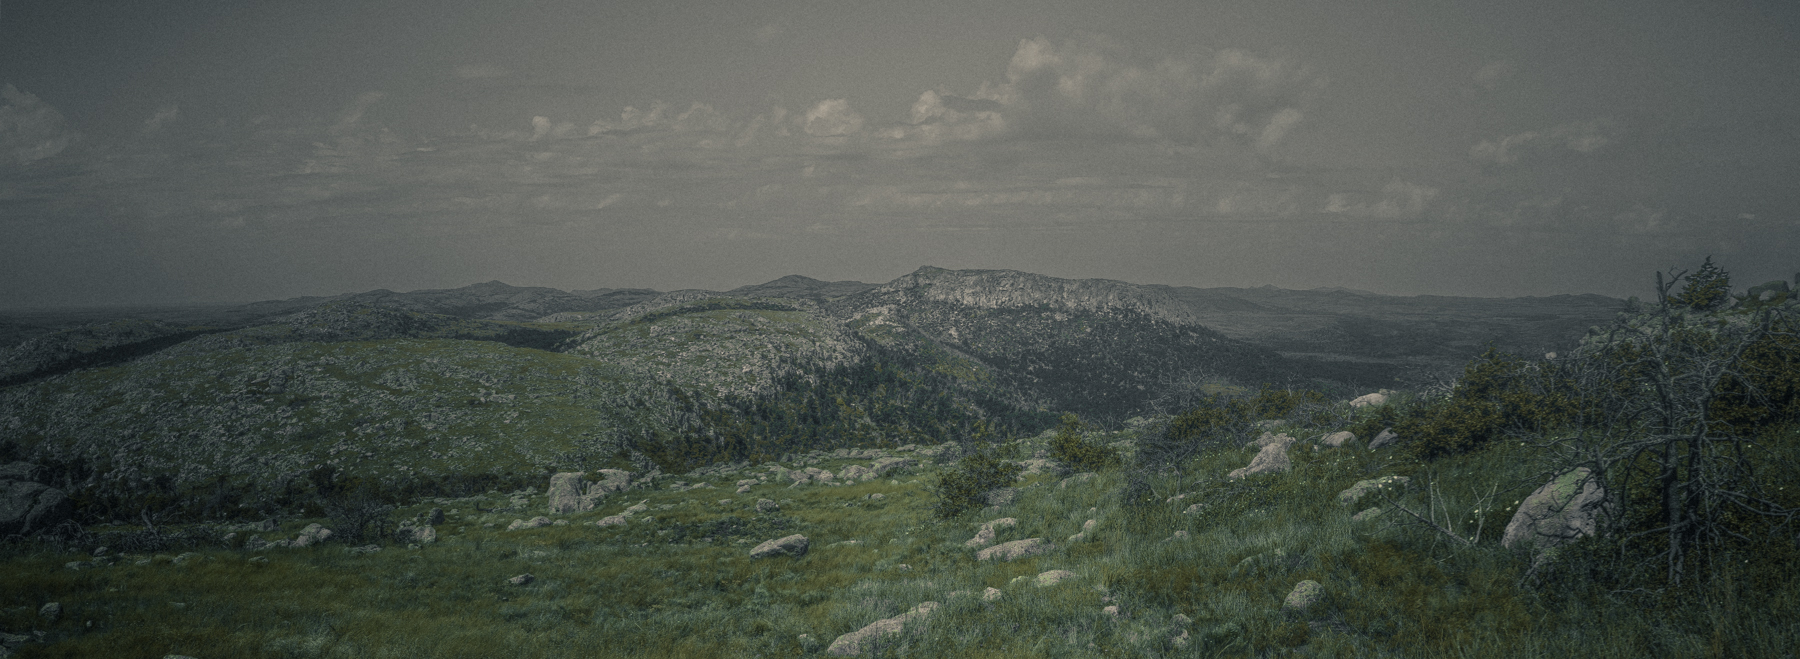 2017-08-21 Mount Sheridan ECLIPSE C (4 of 15).jpg